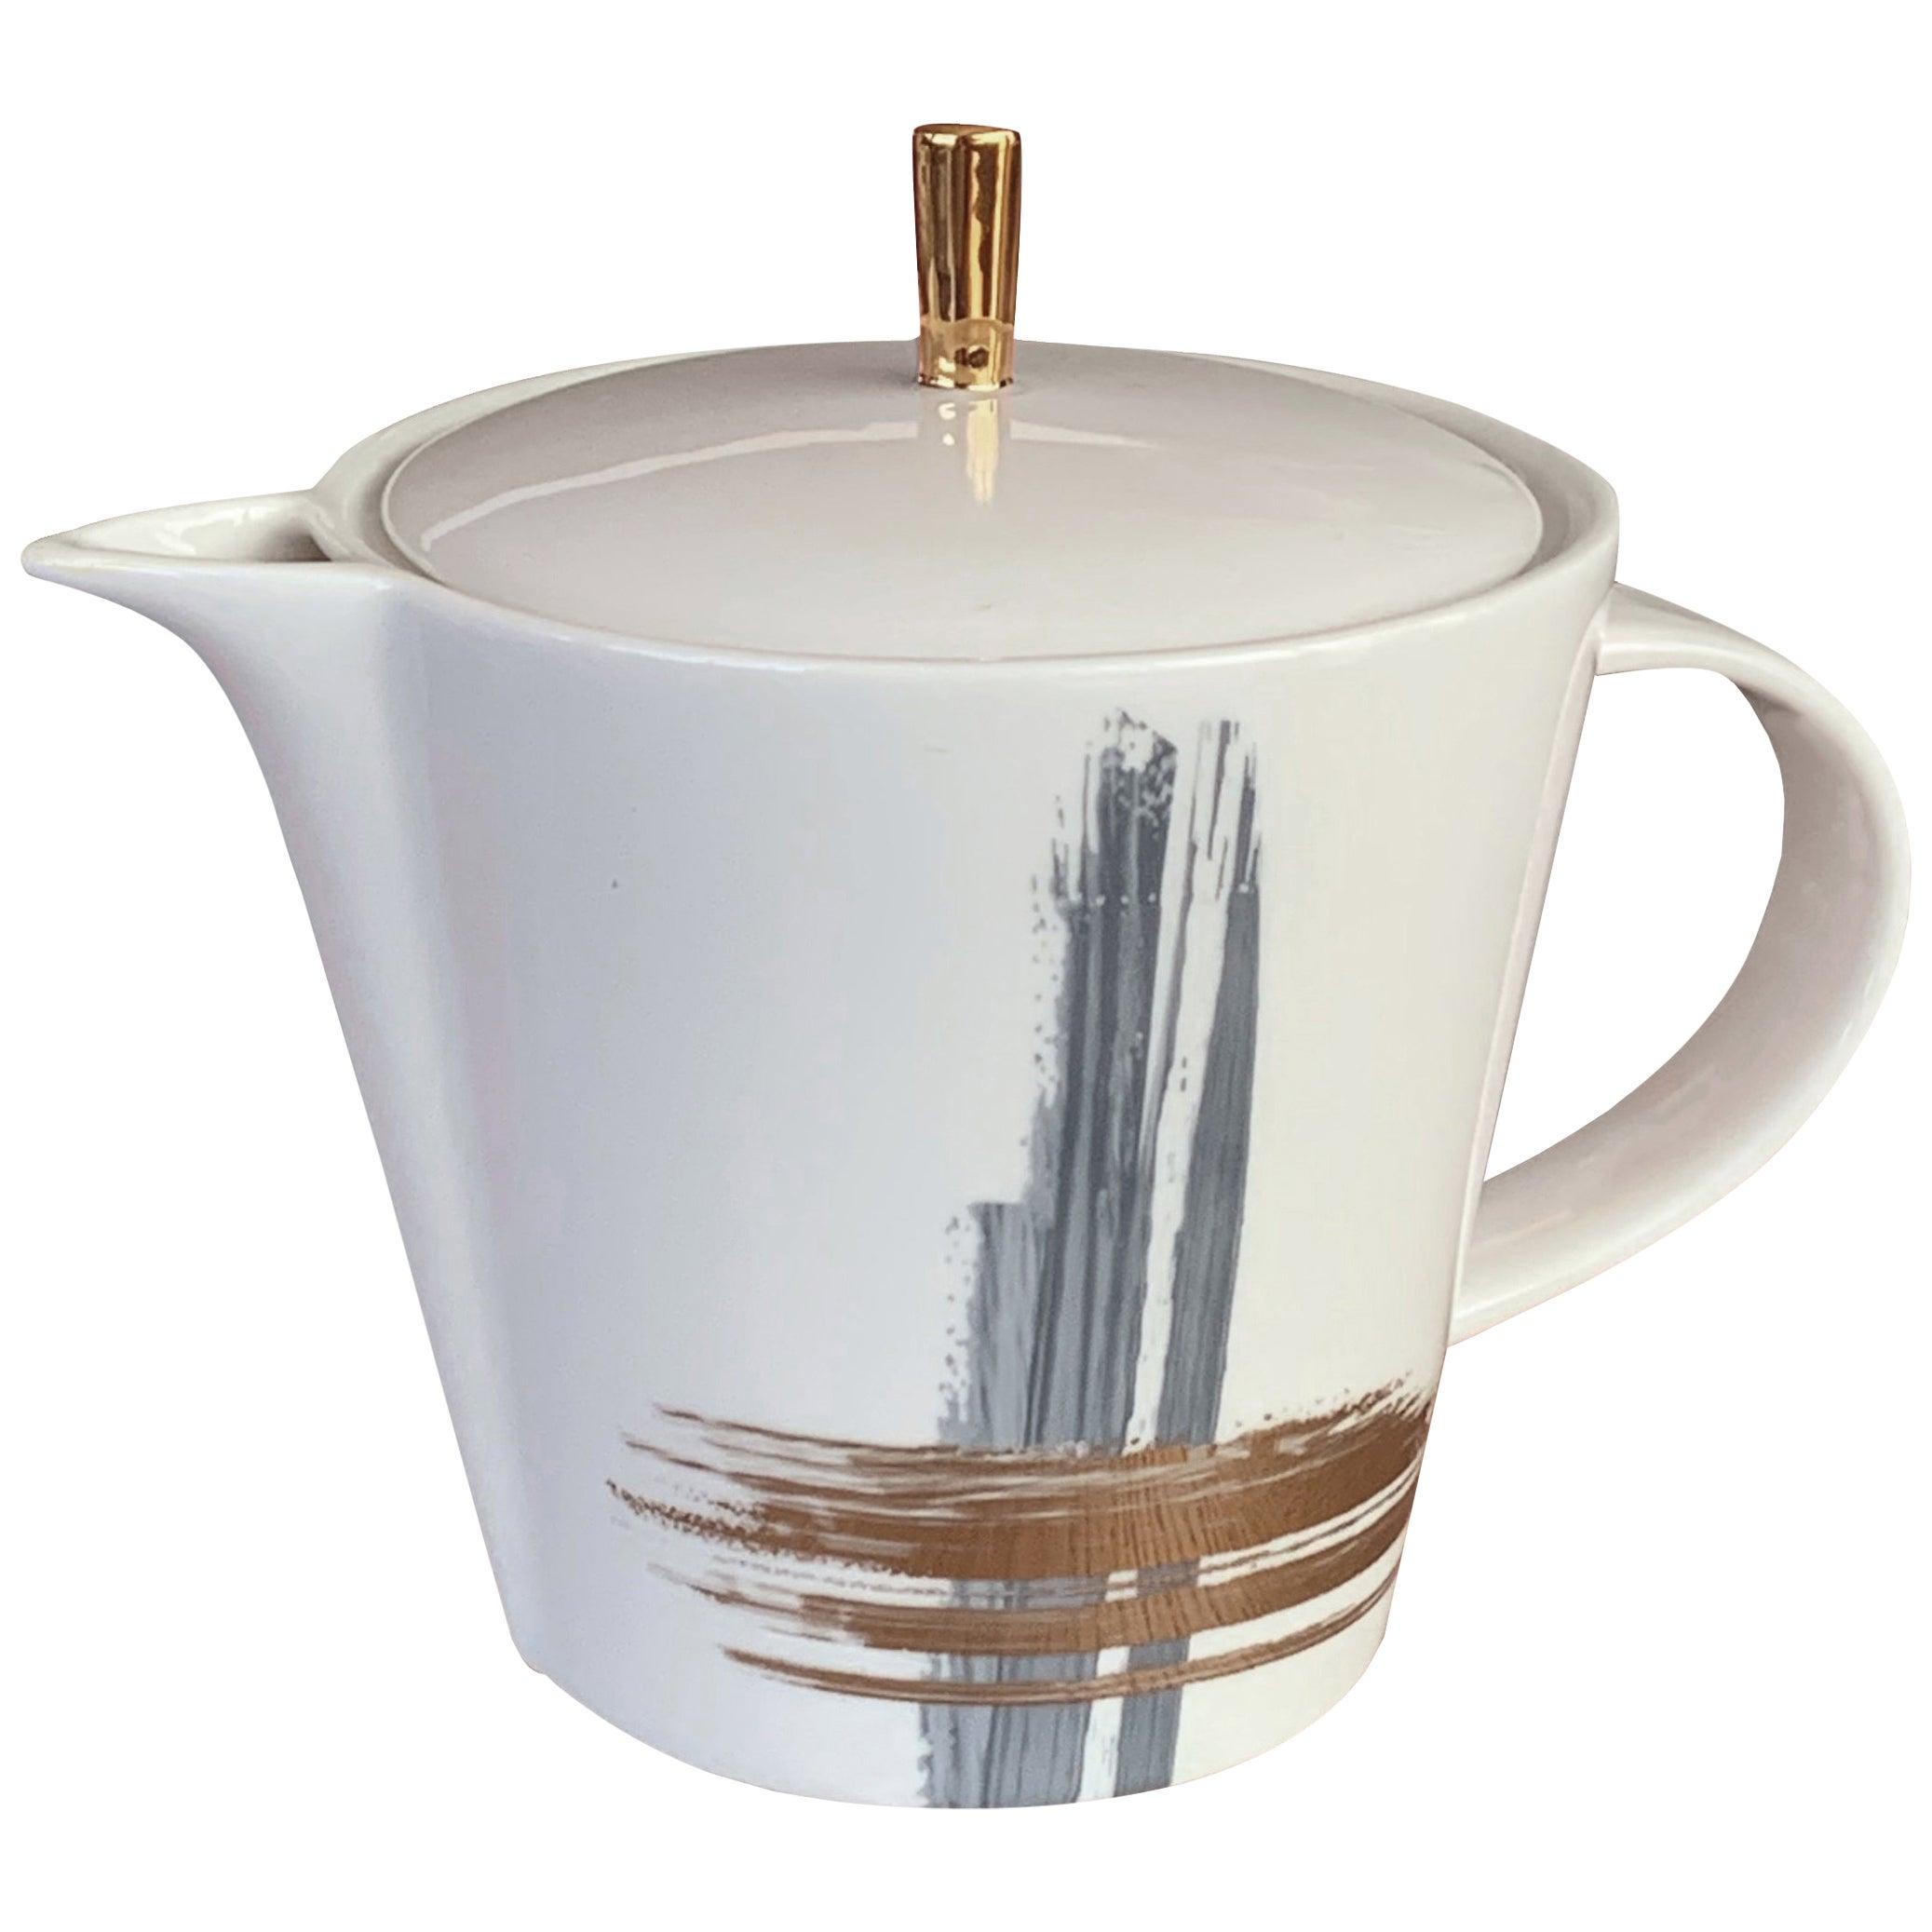 Medium Tea Pot Artisan Brush André Fu Living Tableware New